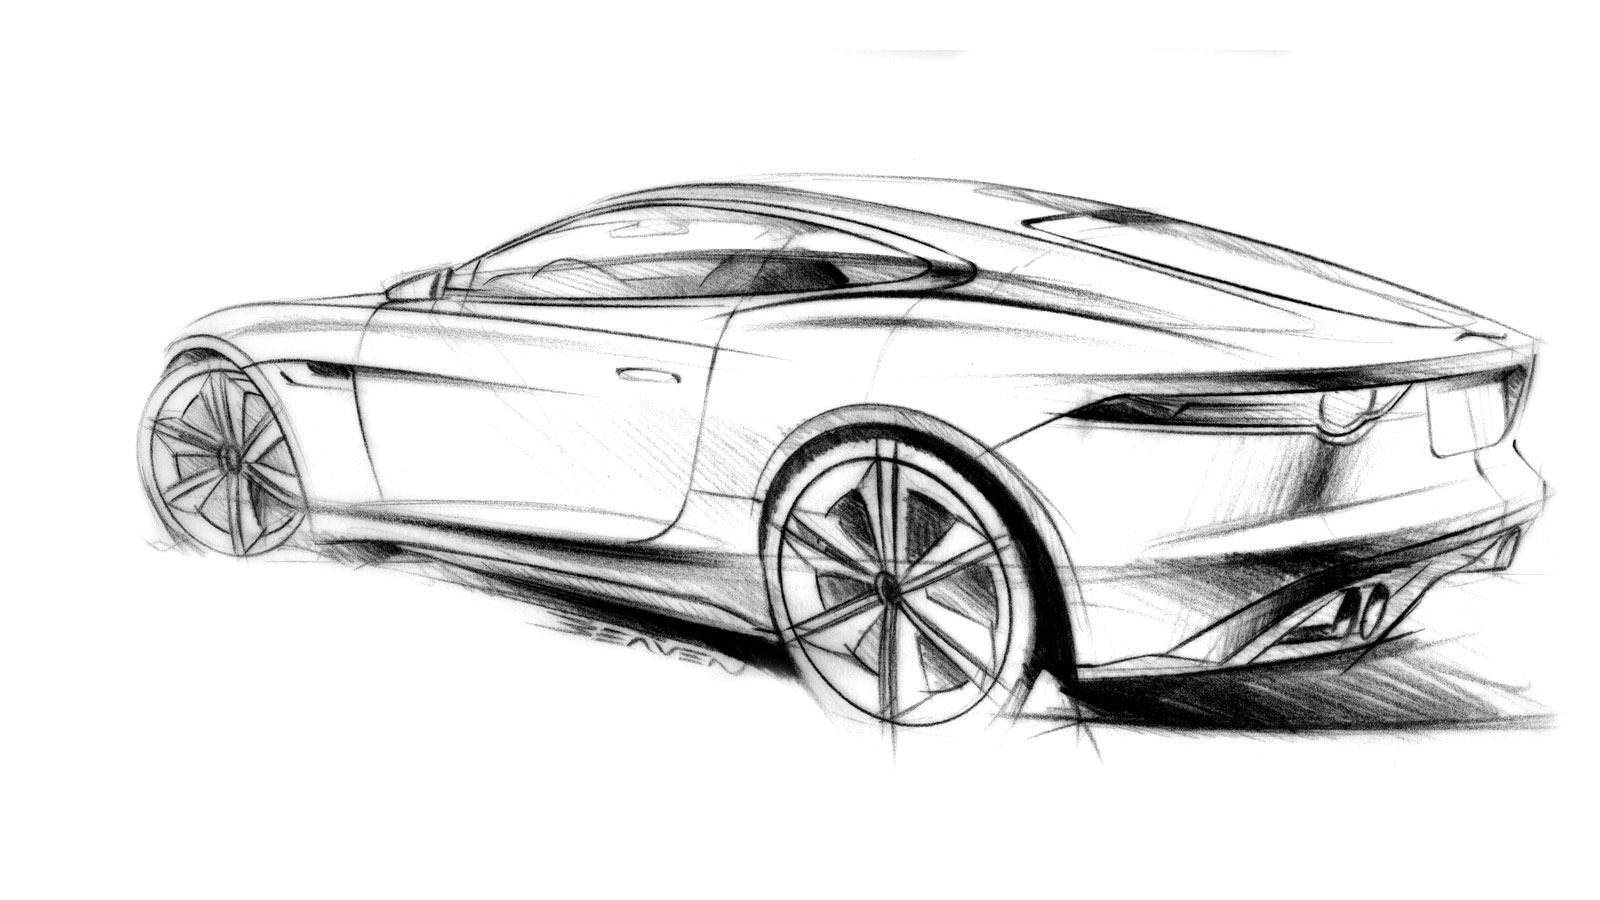 Jaguar C X16 Concept Design Sketch